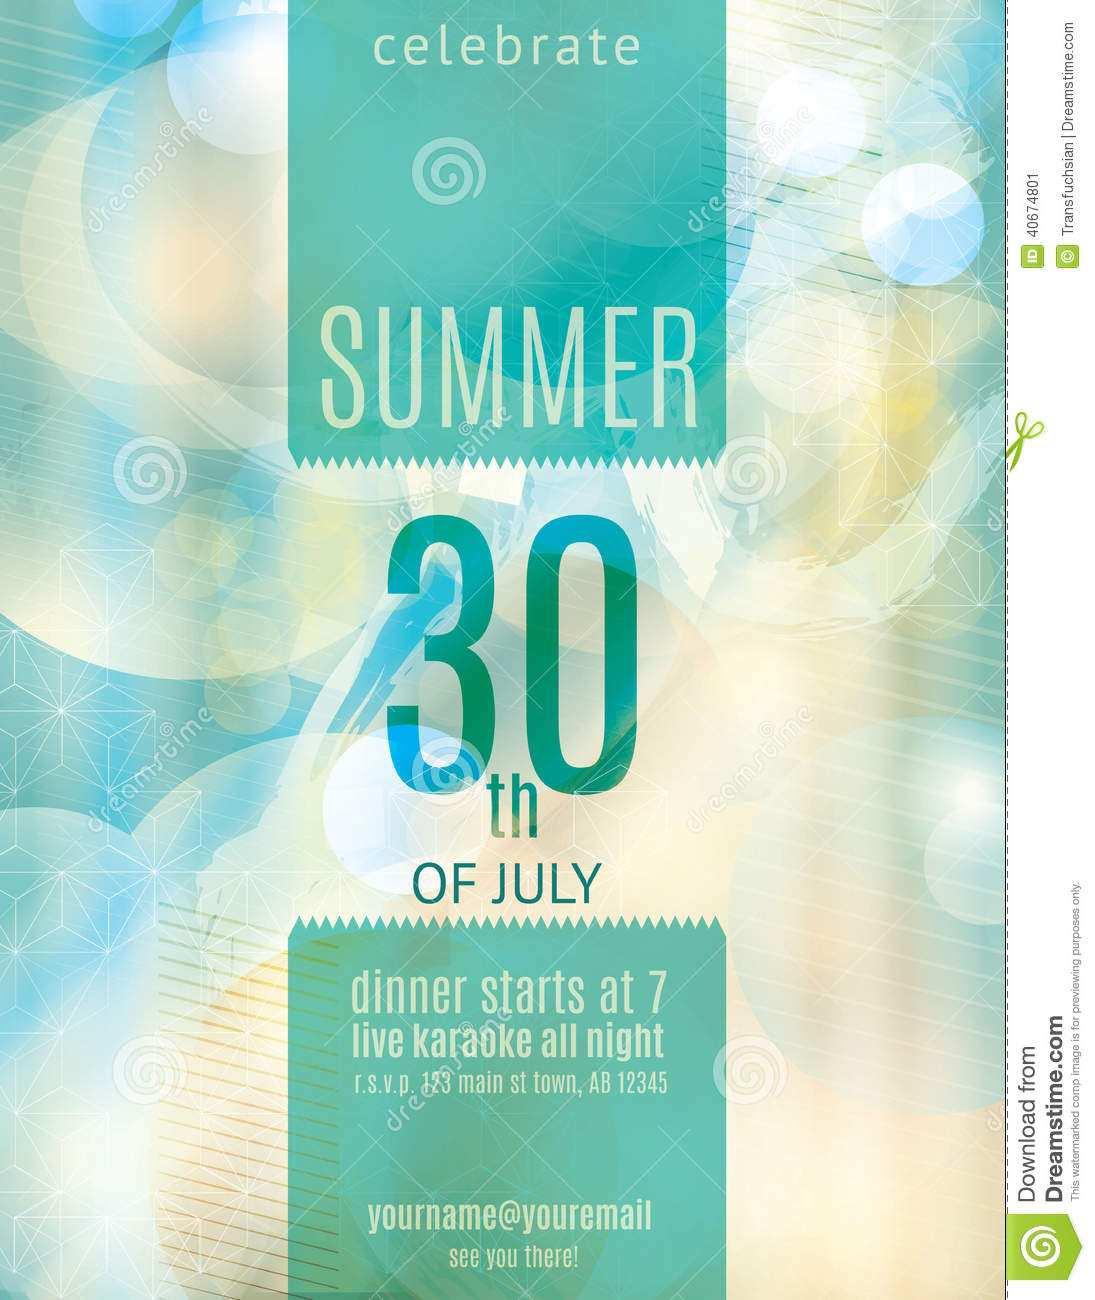 58 Customize Template For Elegant Birthday Invitation Now for Template For Elegant Birthday Invitation